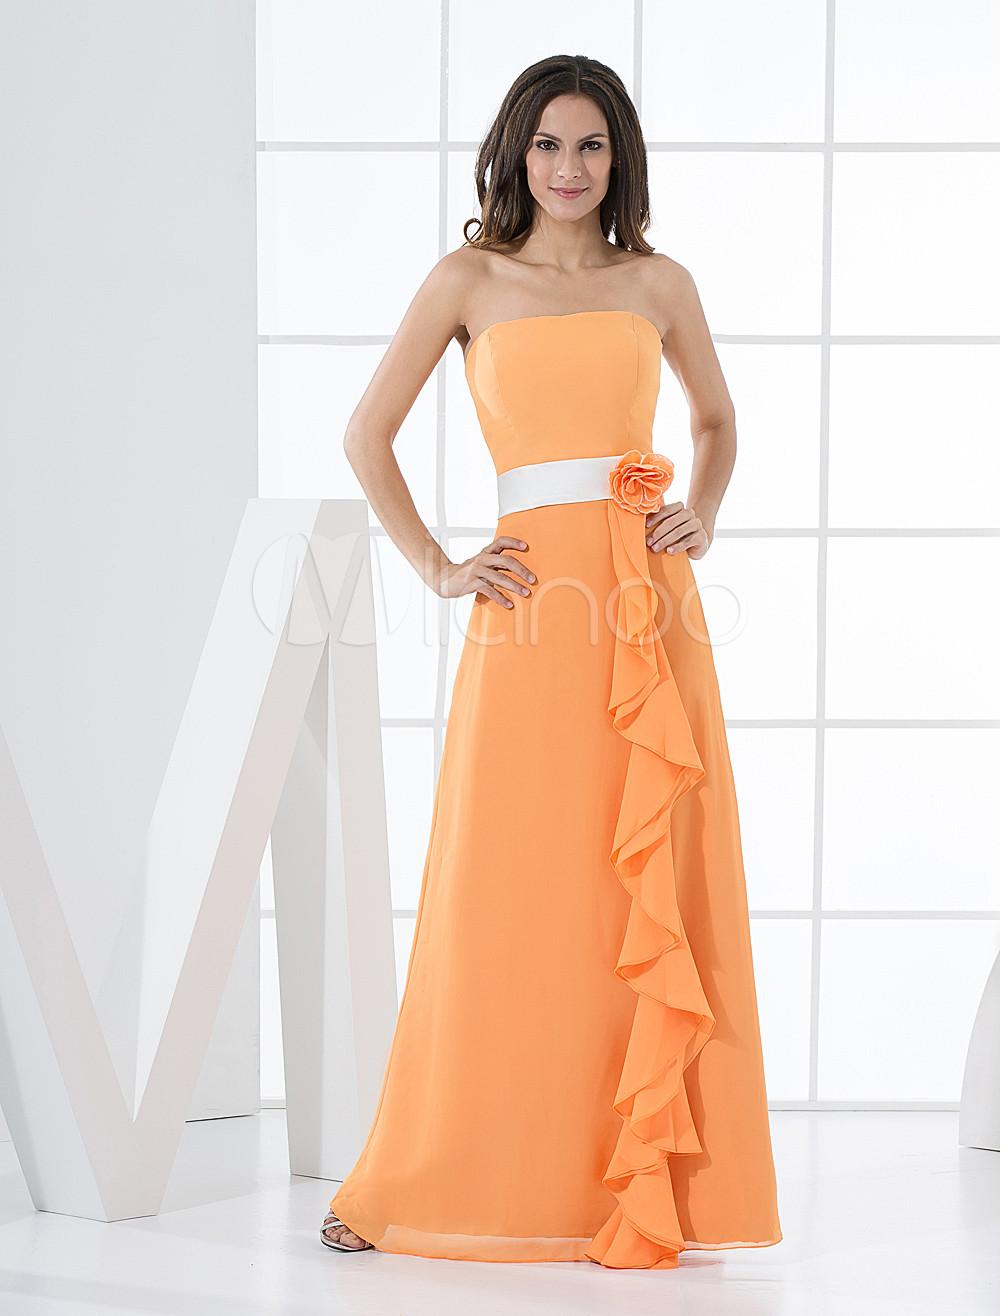 Strapless Cascading Ruffle Chiffon Orange Charming Bridesmaid Dress